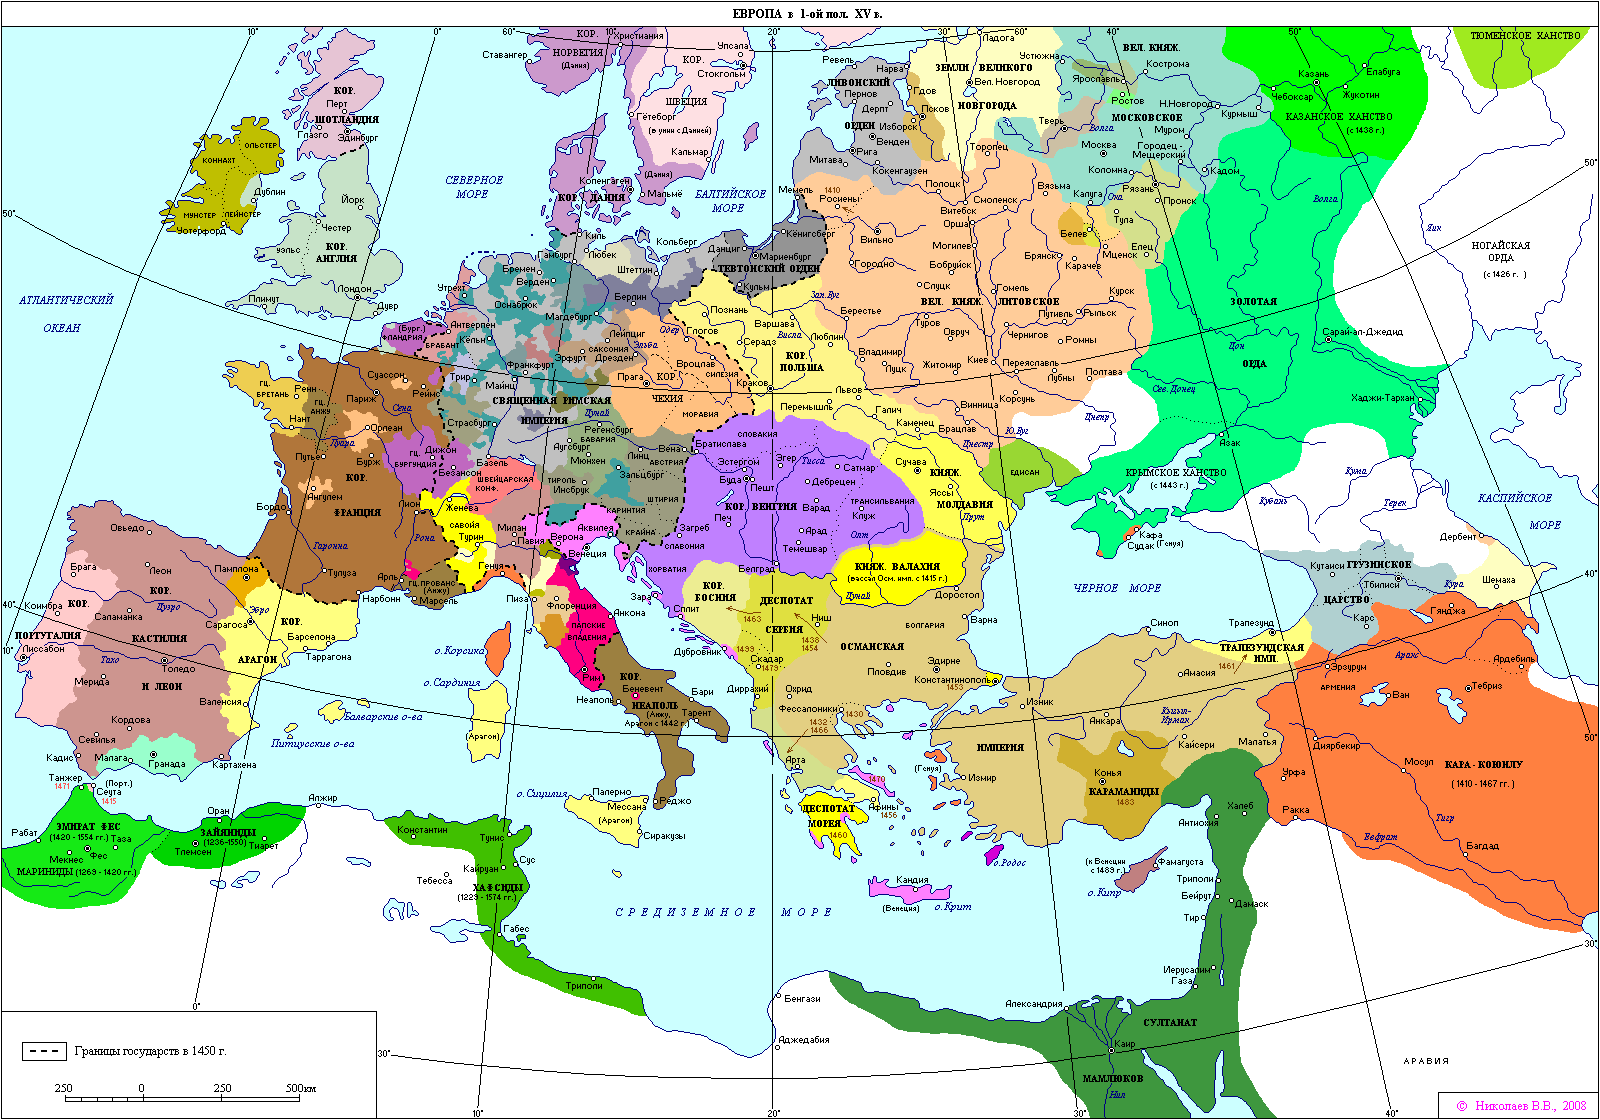 037-europe1400-1450